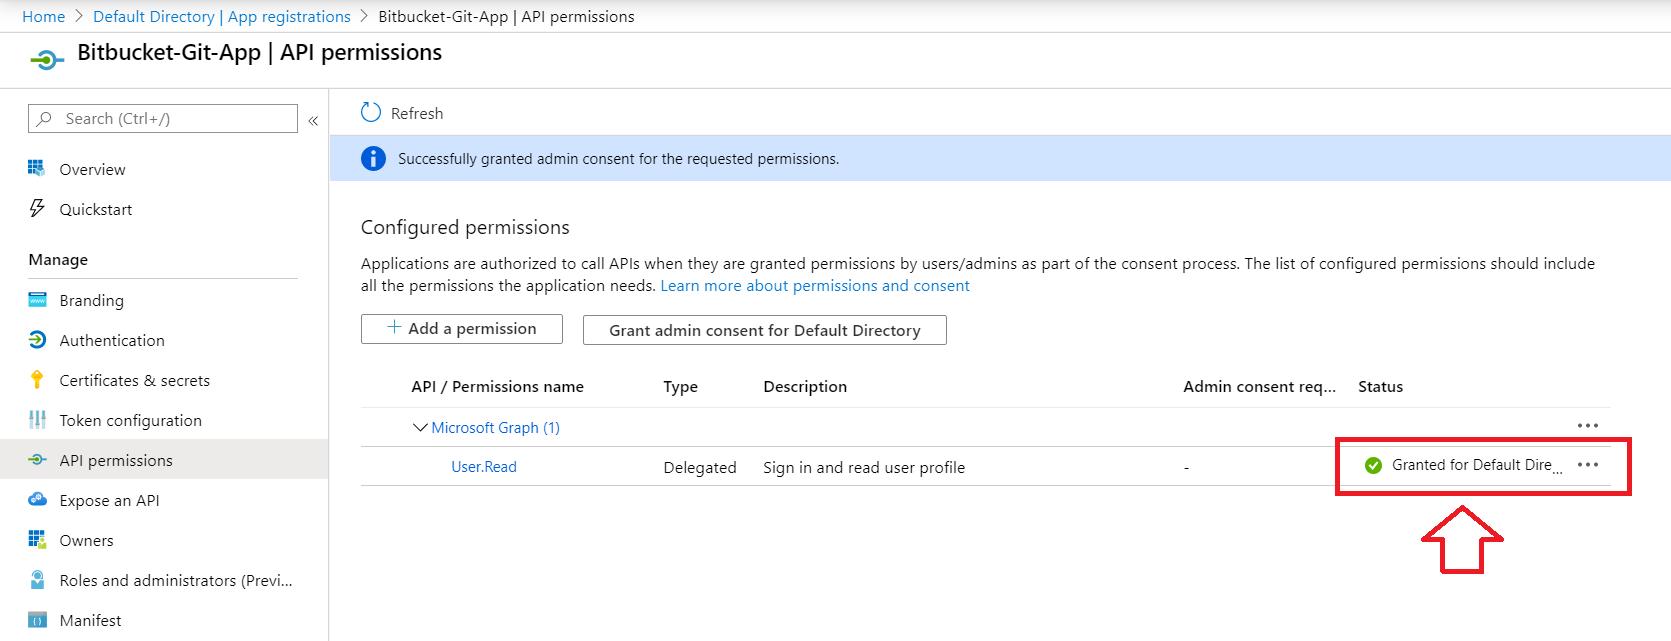 SAML Single Sign On Bitbucket using AzureAD,SSO